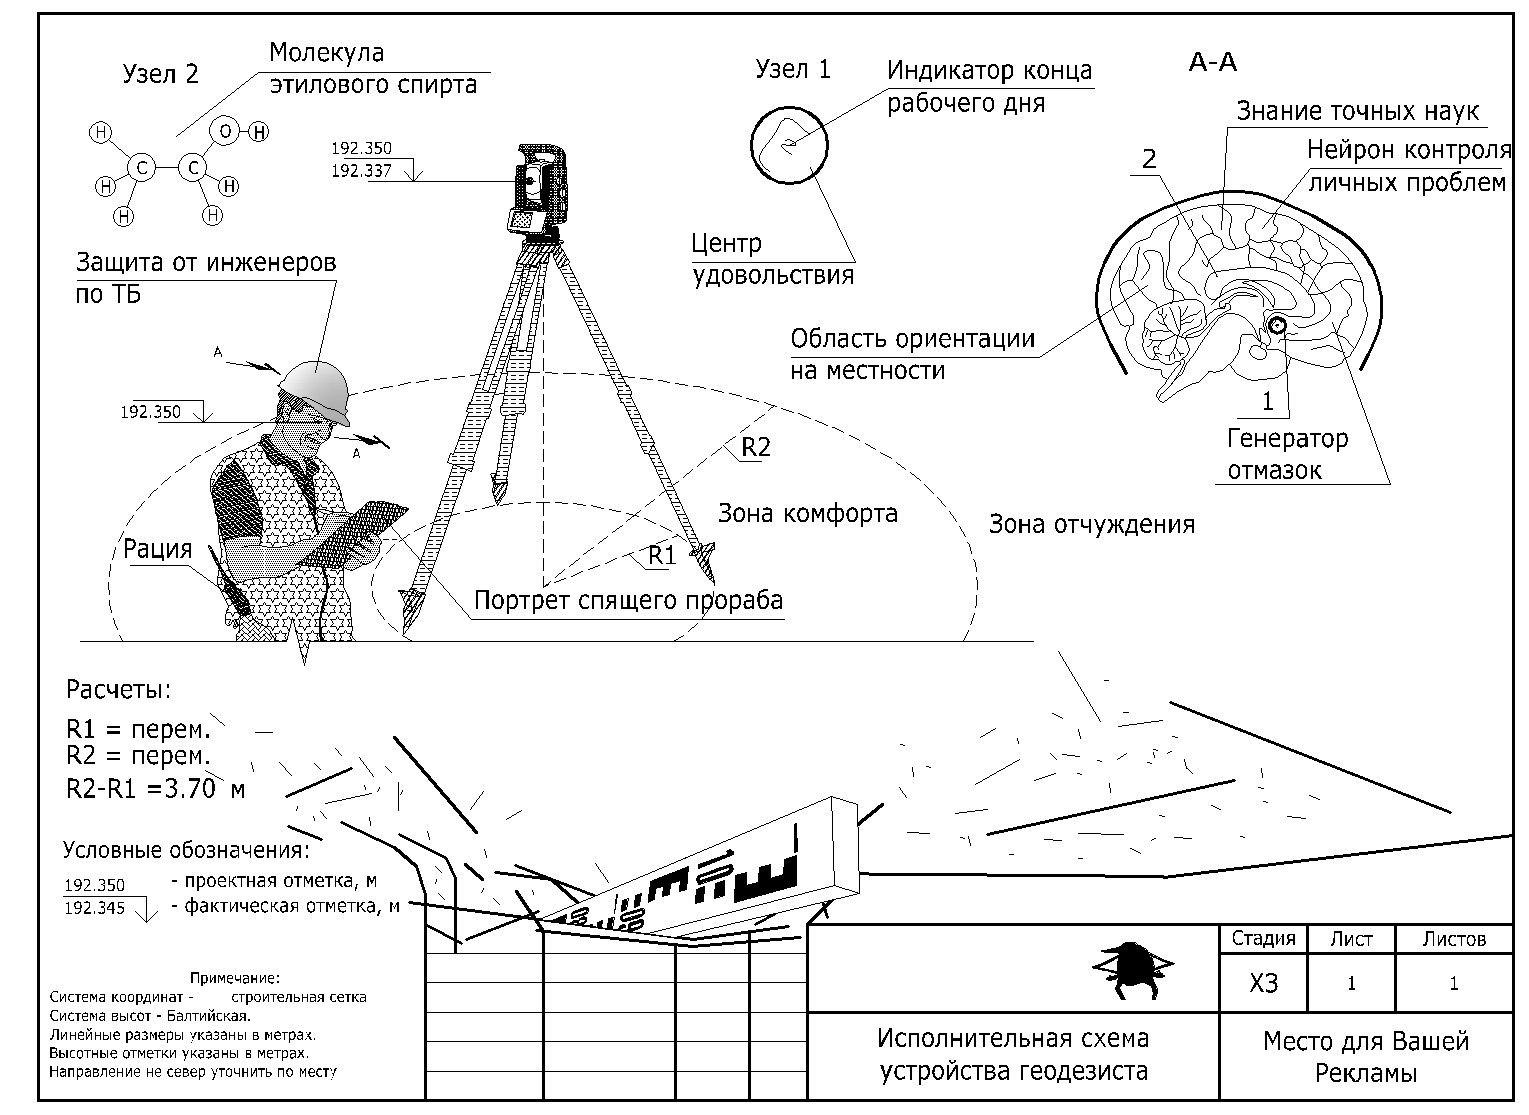 Схема устройства мозга